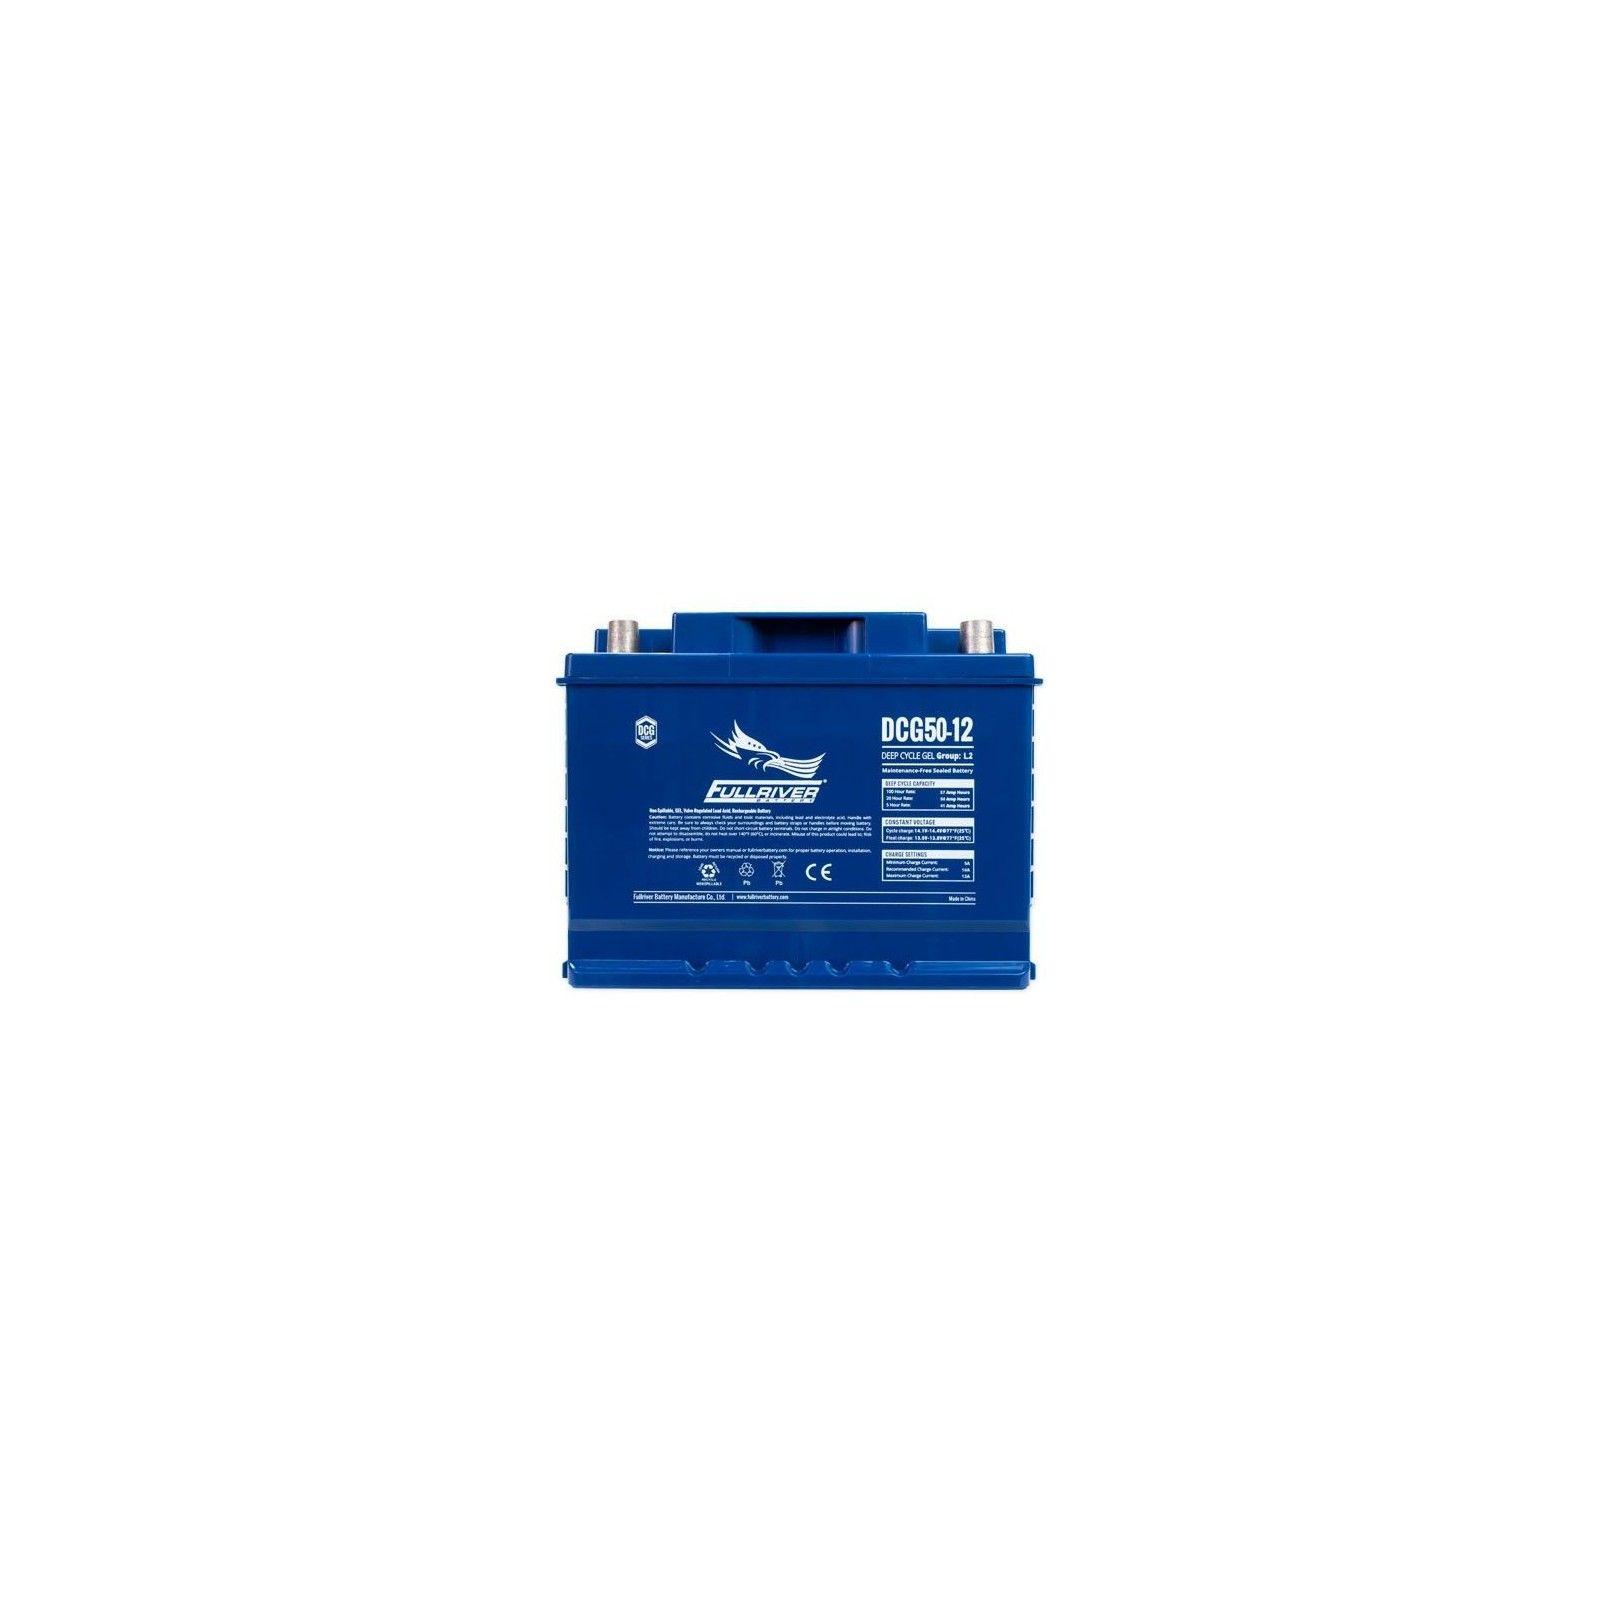 BATERIA Fullriver FULLRIVER DCG50-12 50Ah 12V FULLRIVER - 1